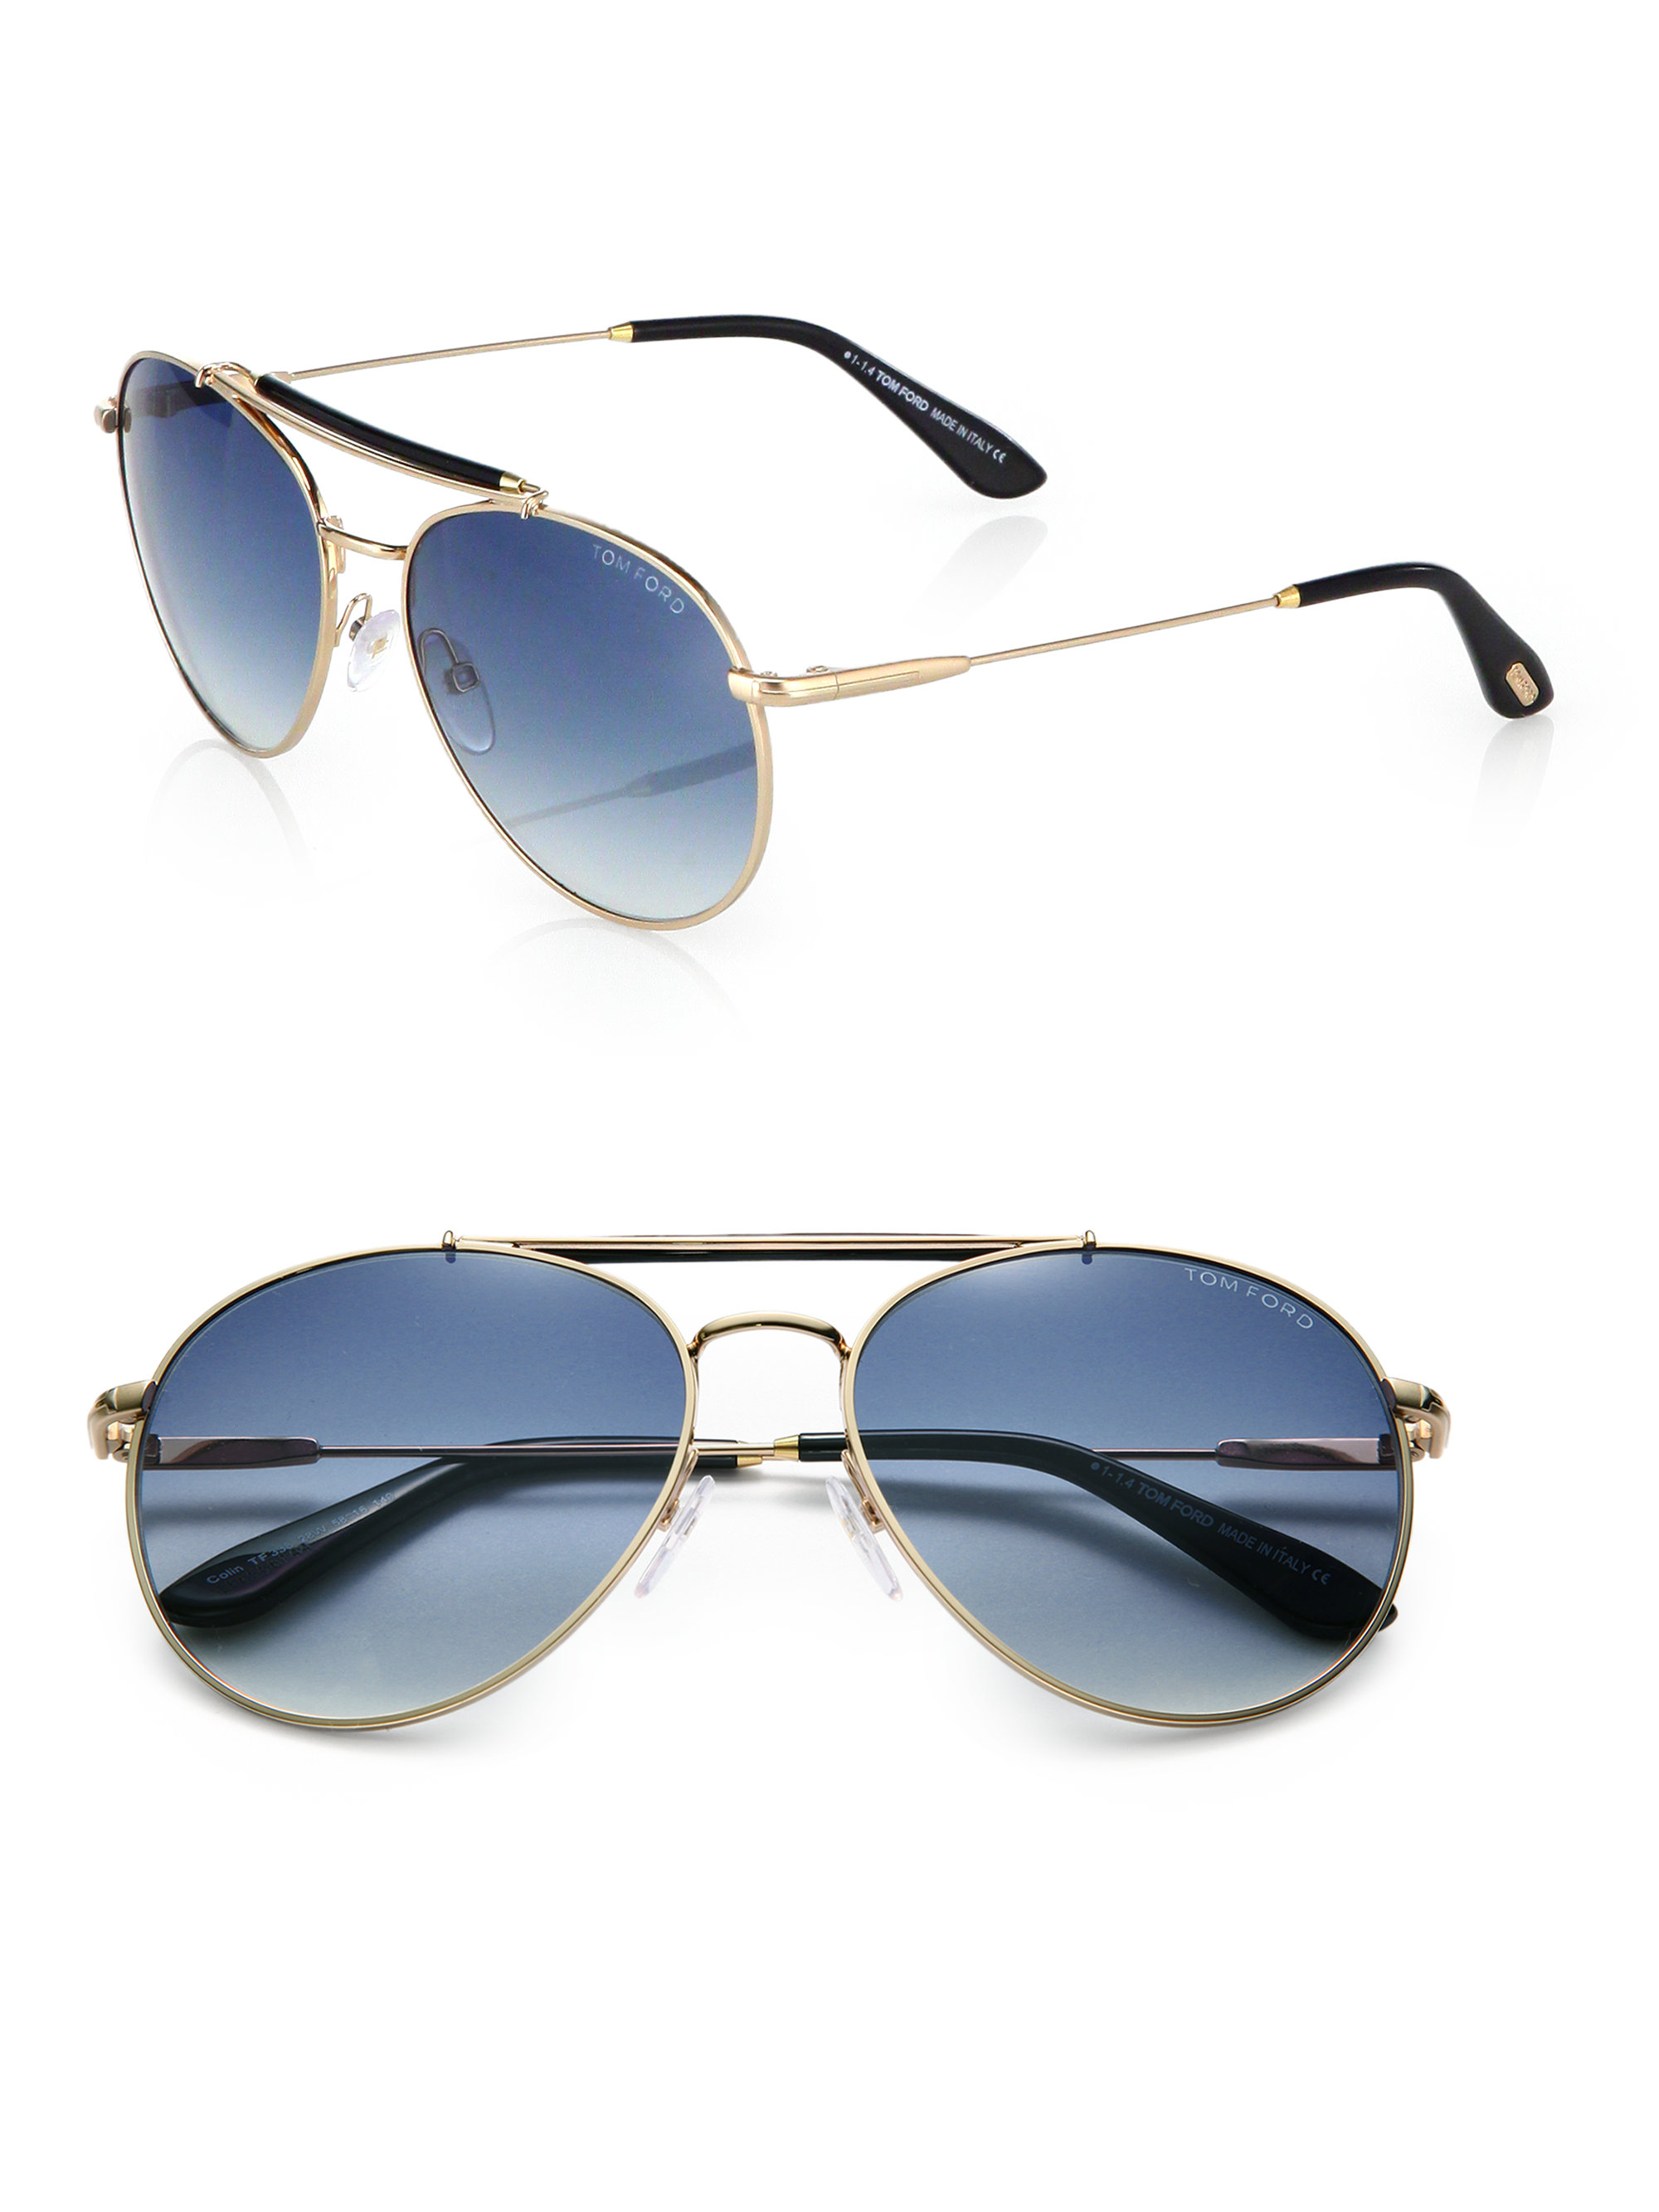 tom ford colin metal aviator sunglasses in blue for men lyst. Black Bedroom Furniture Sets. Home Design Ideas